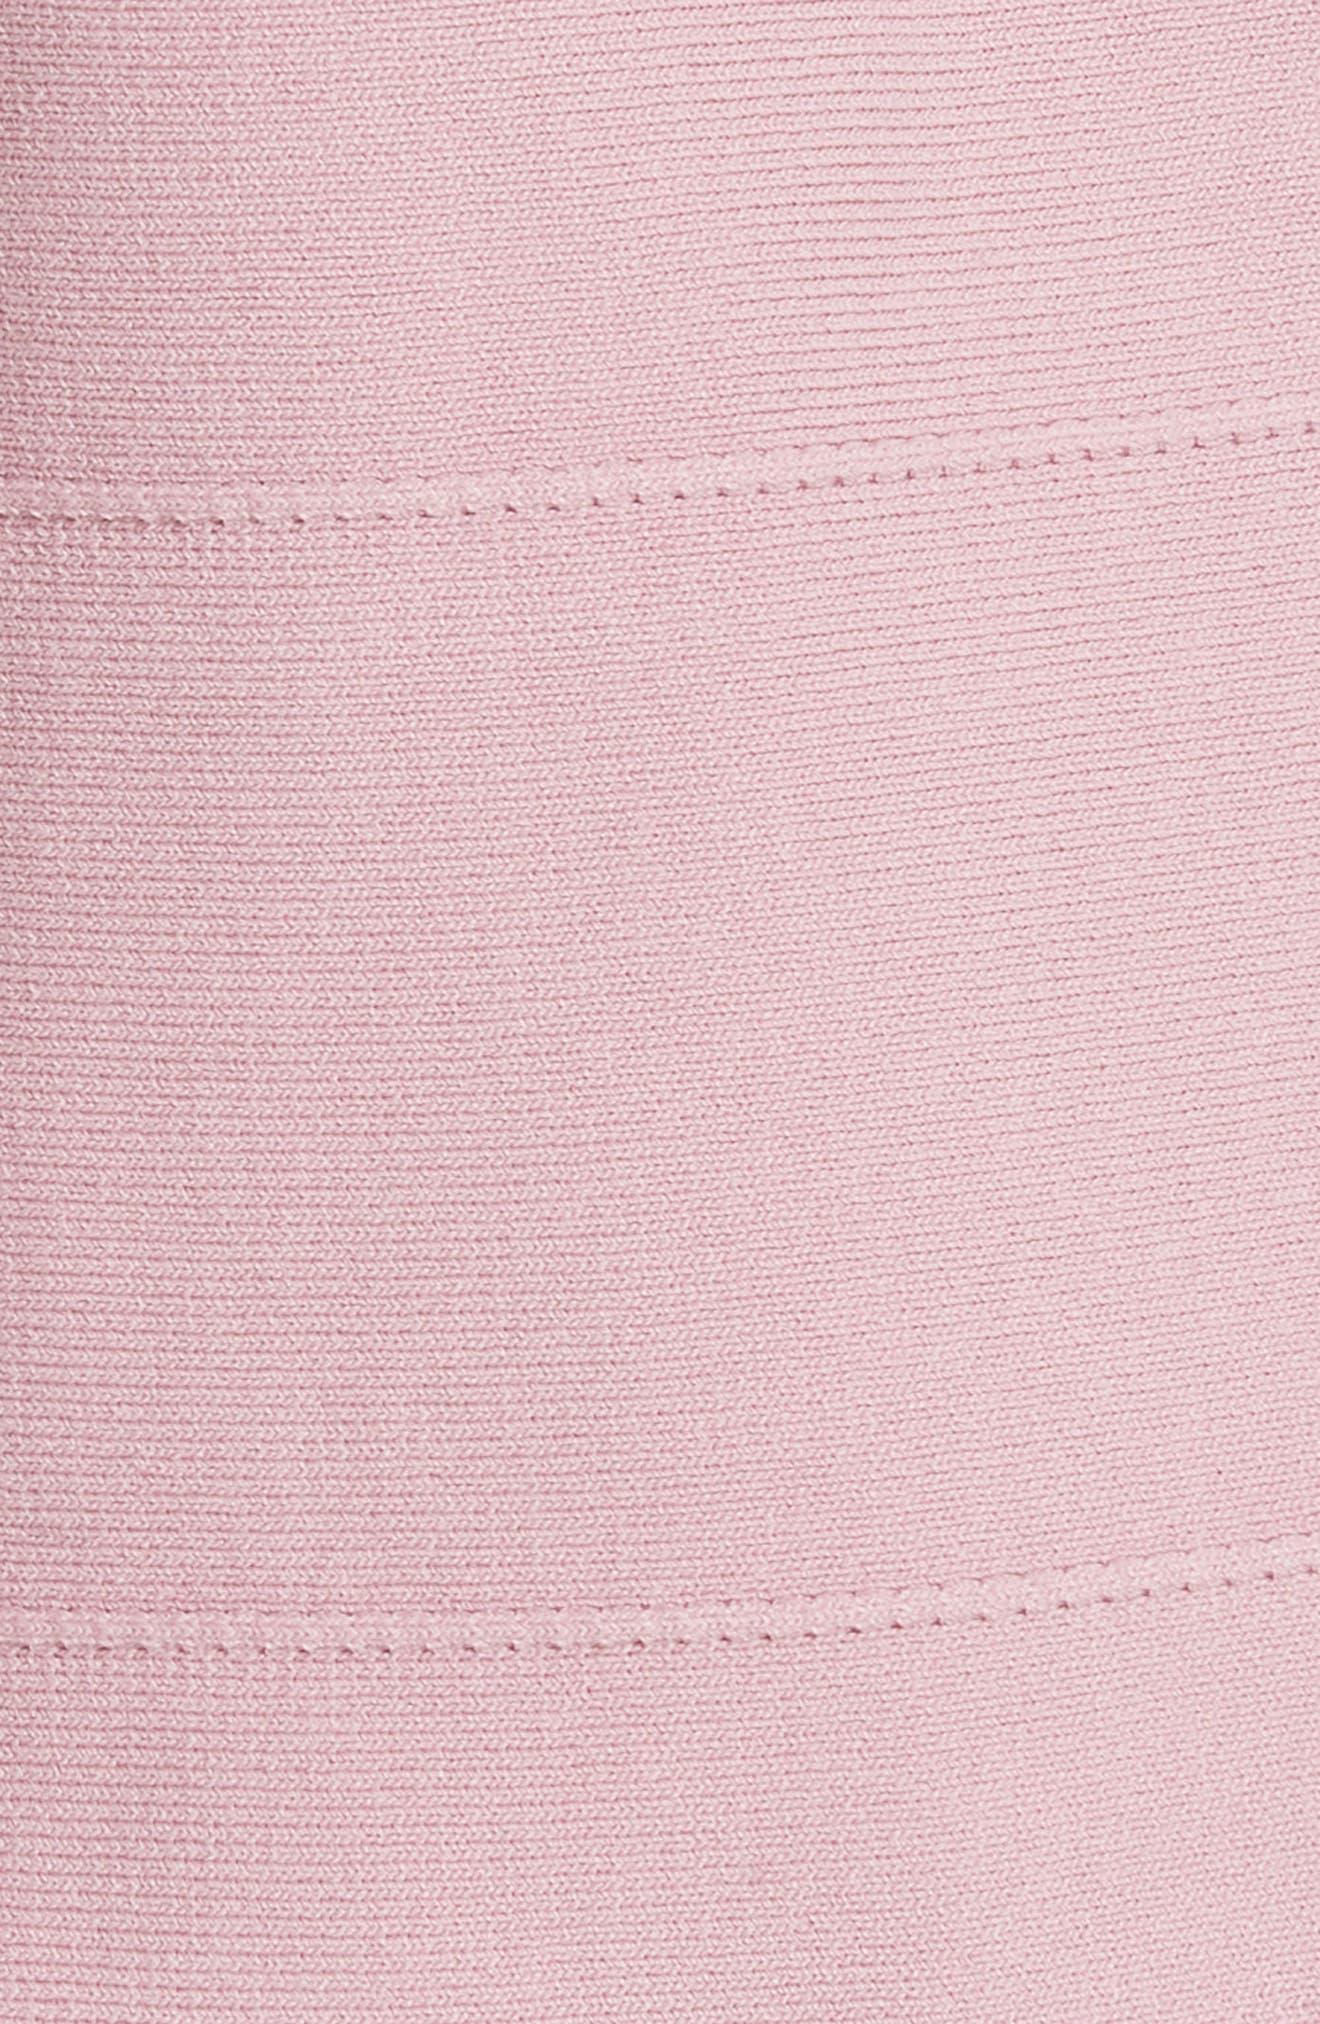 Bow Neck Knit Top,                             Alternate thumbnail 5, color,                             652